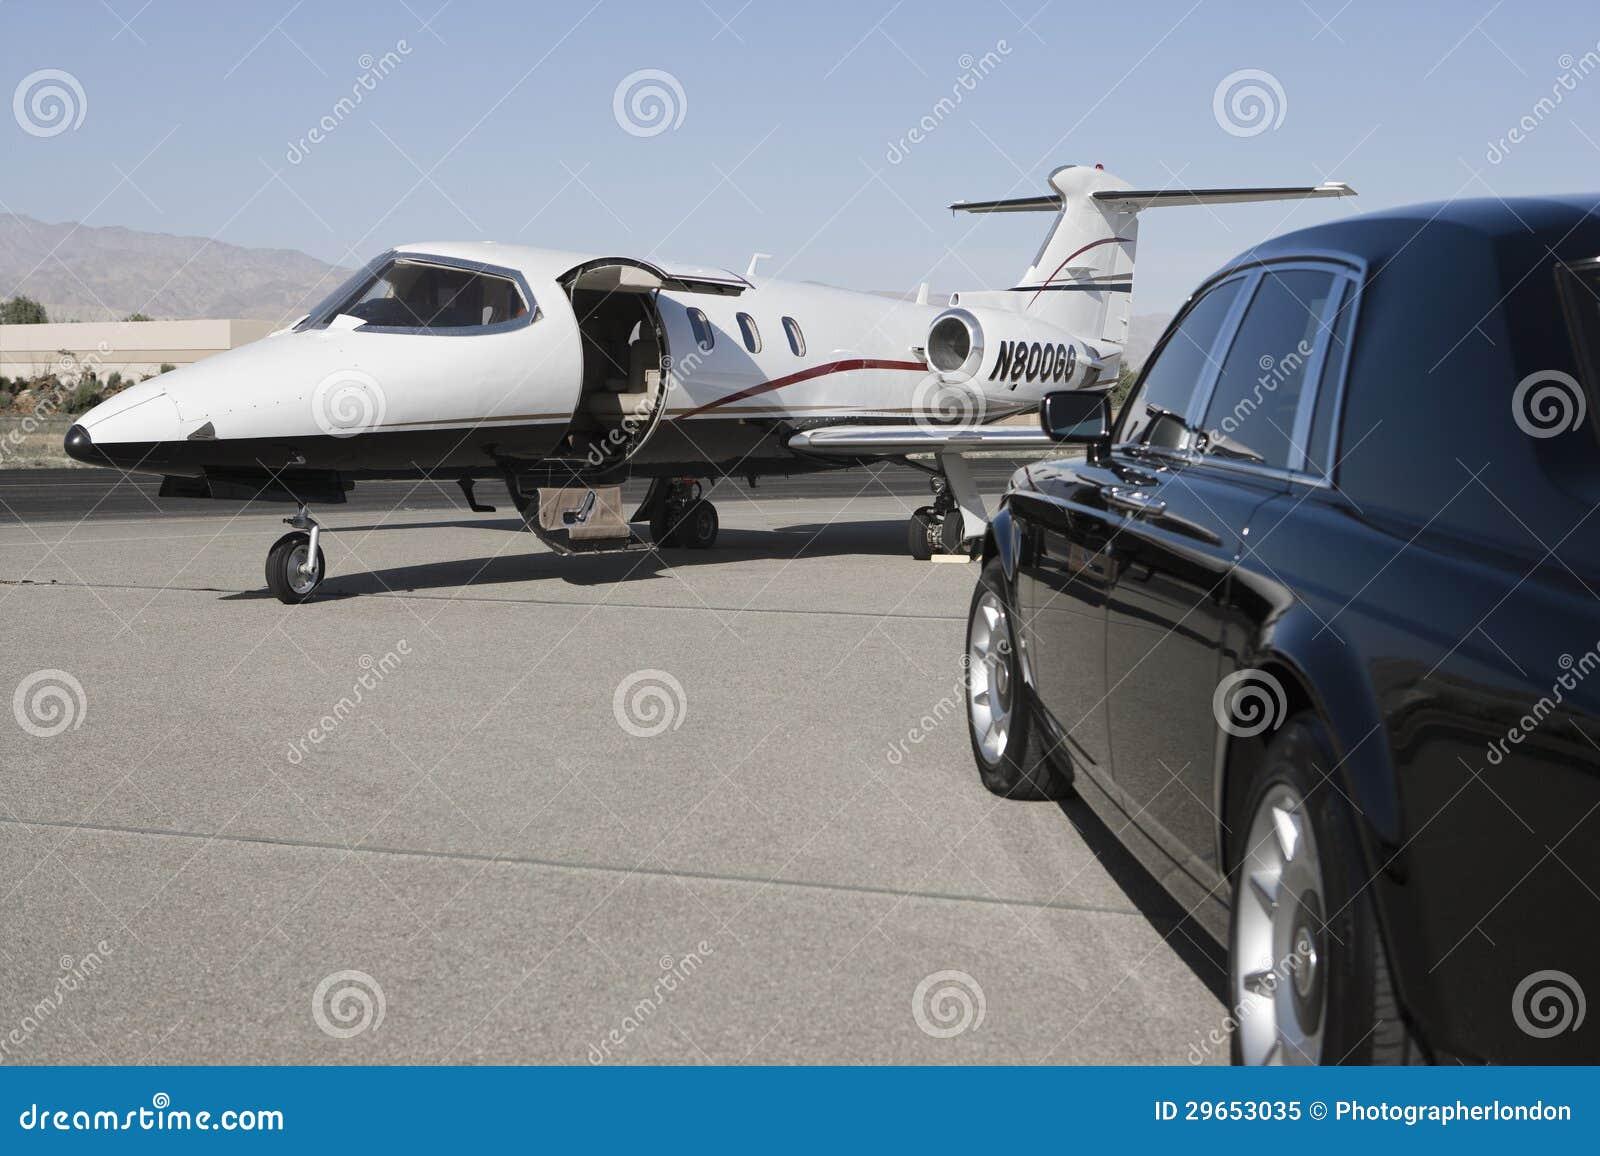 voiture et avion luxueux image stock image du outdoors 29653035. Black Bedroom Furniture Sets. Home Design Ideas